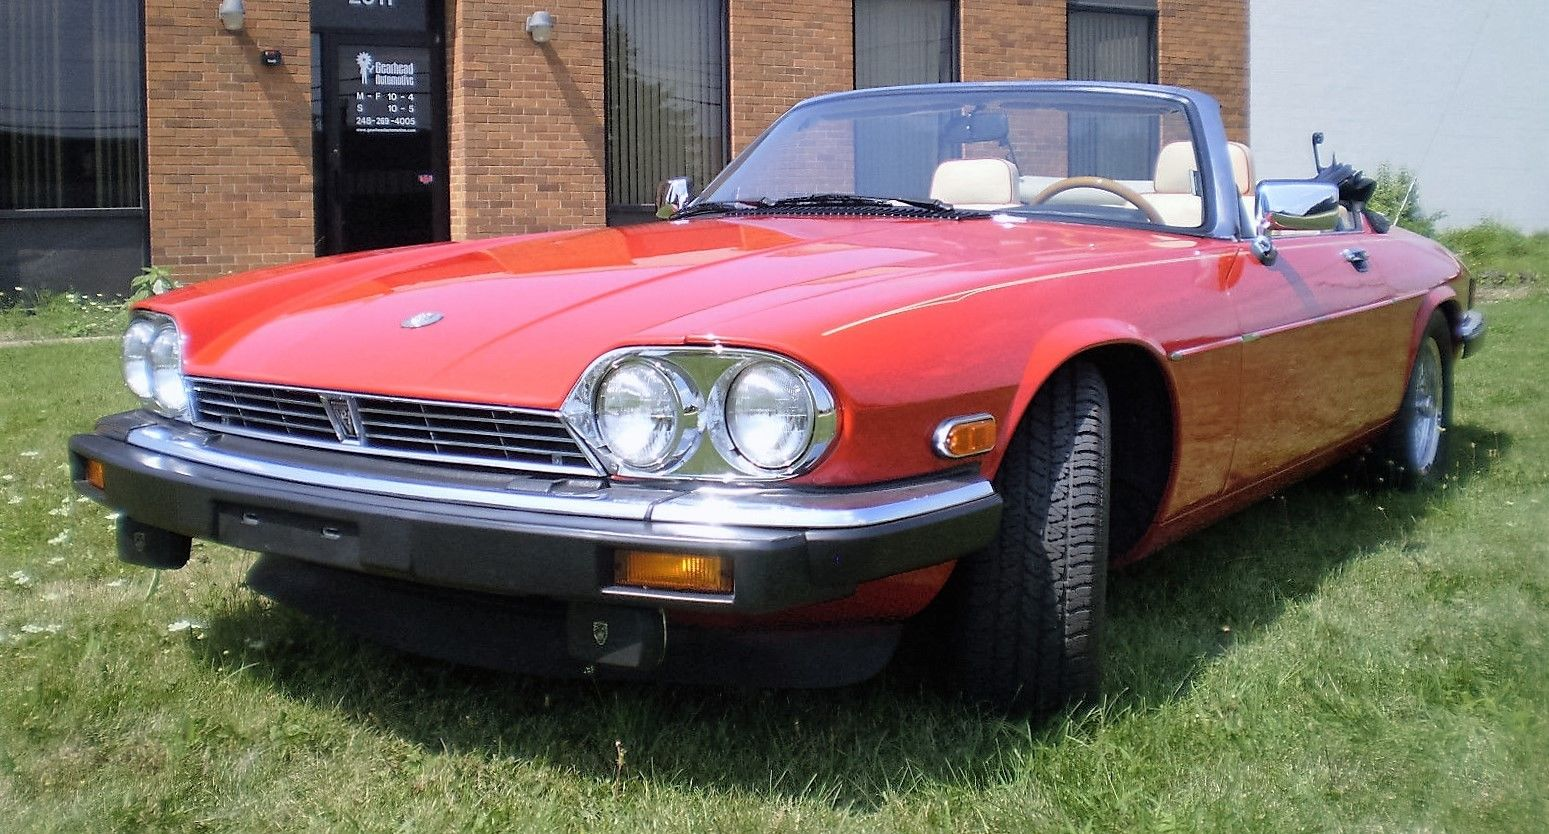 1991 jaguar xjs classic convertible for sale for Classic american convertibles for sale